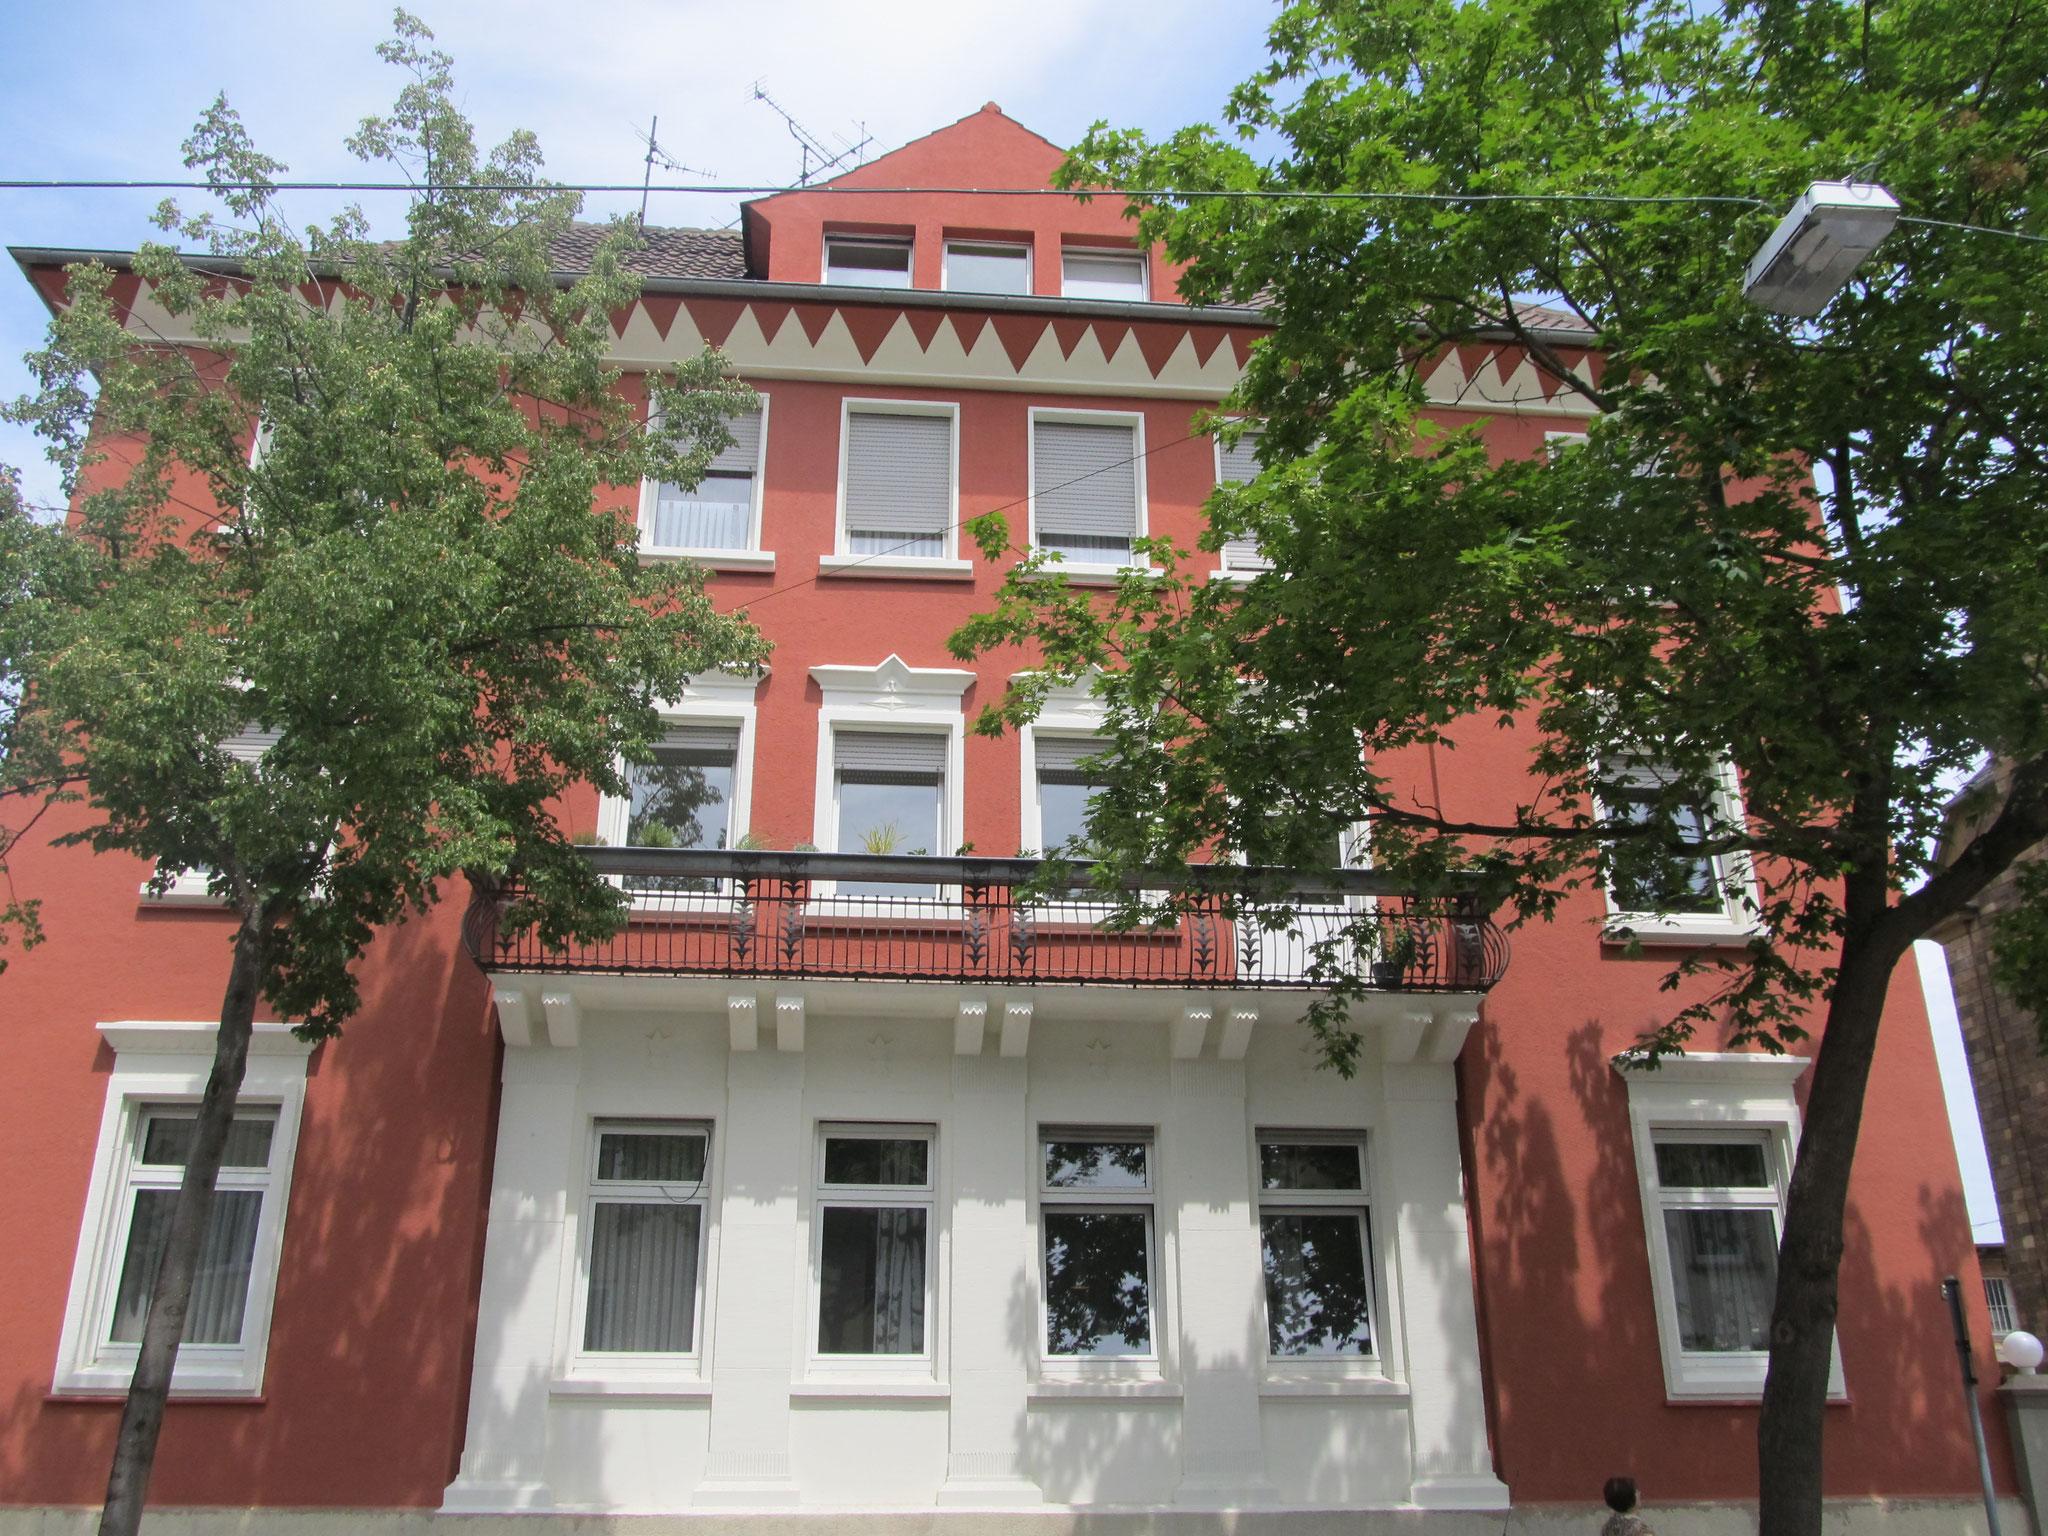 Denkmalgeschützte Fassade im neuen Glanz